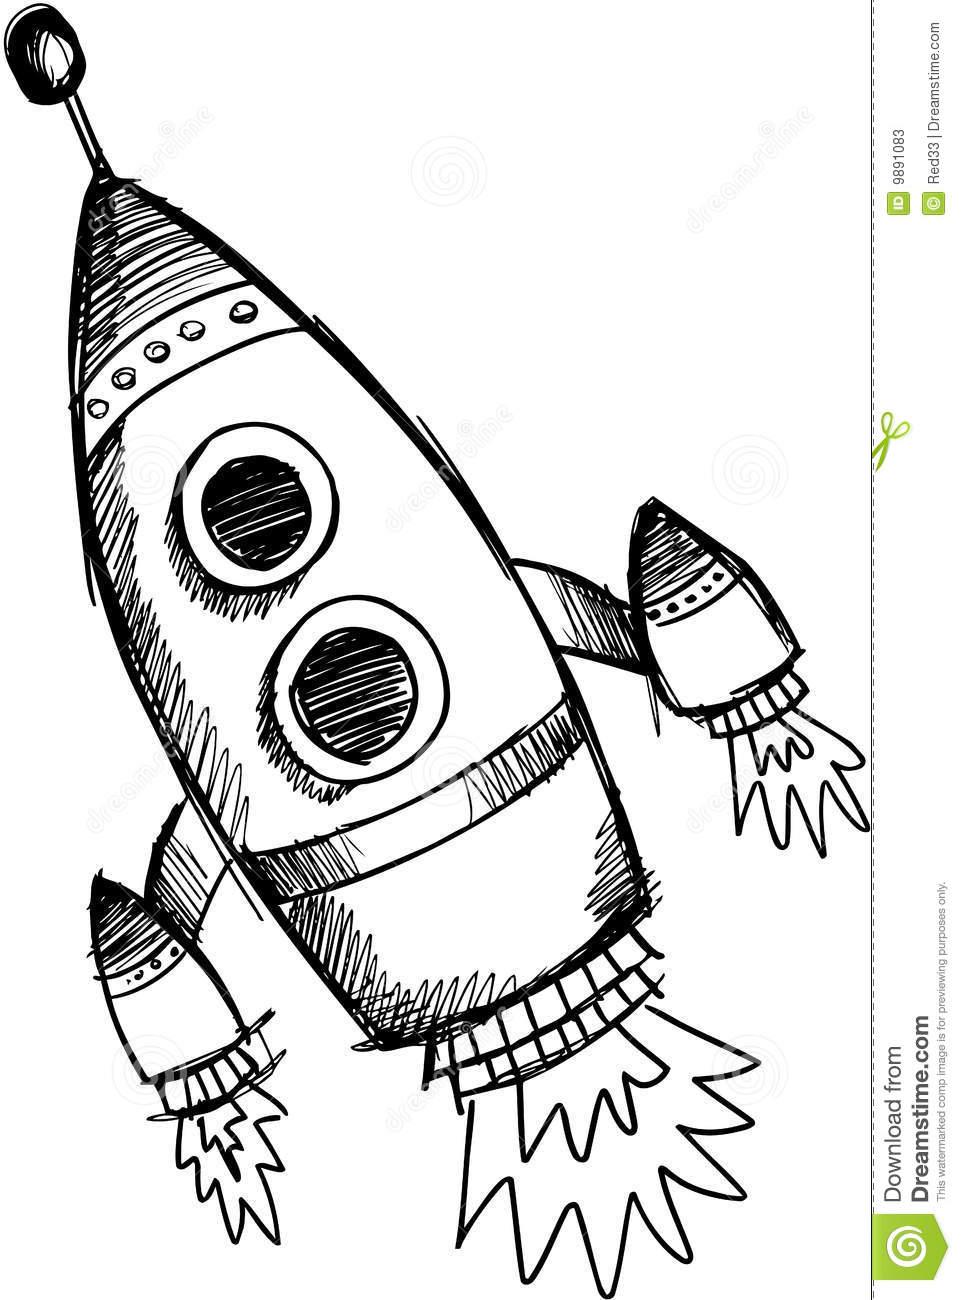 961x1300 Drawn Rocket Vector